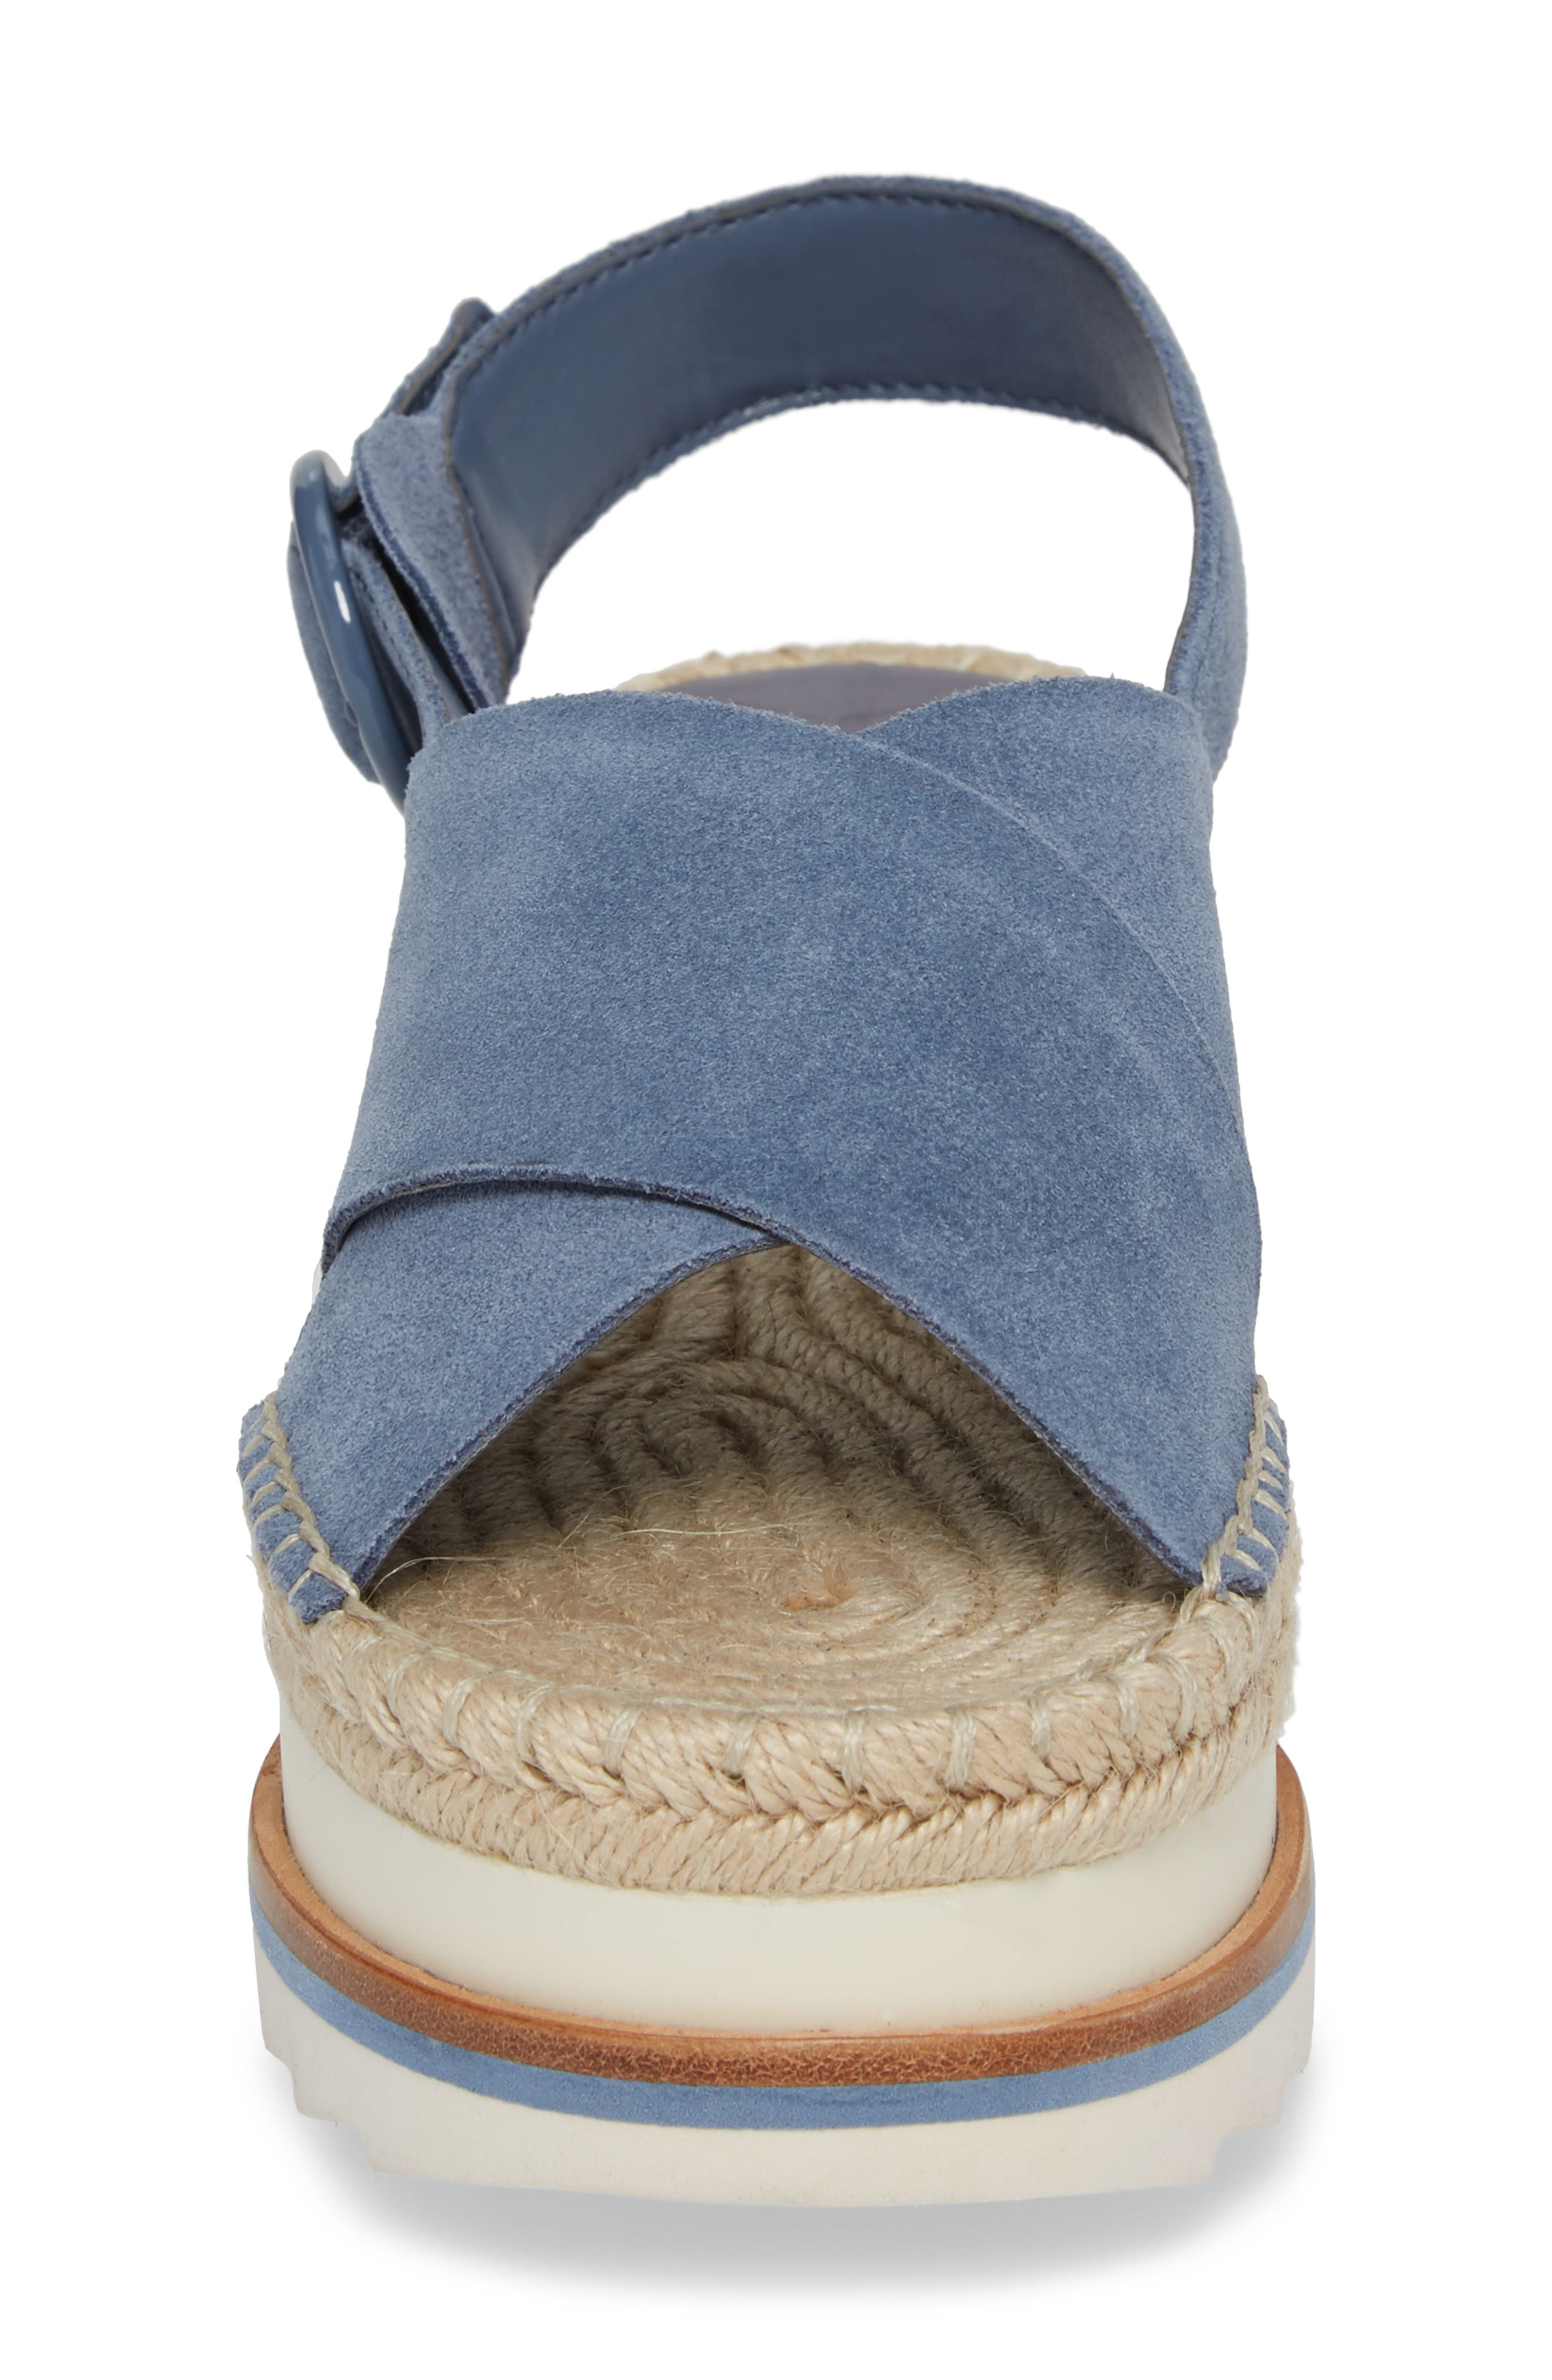 Glenna Platform Slingback Sandal,                             Alternate thumbnail 15, color,